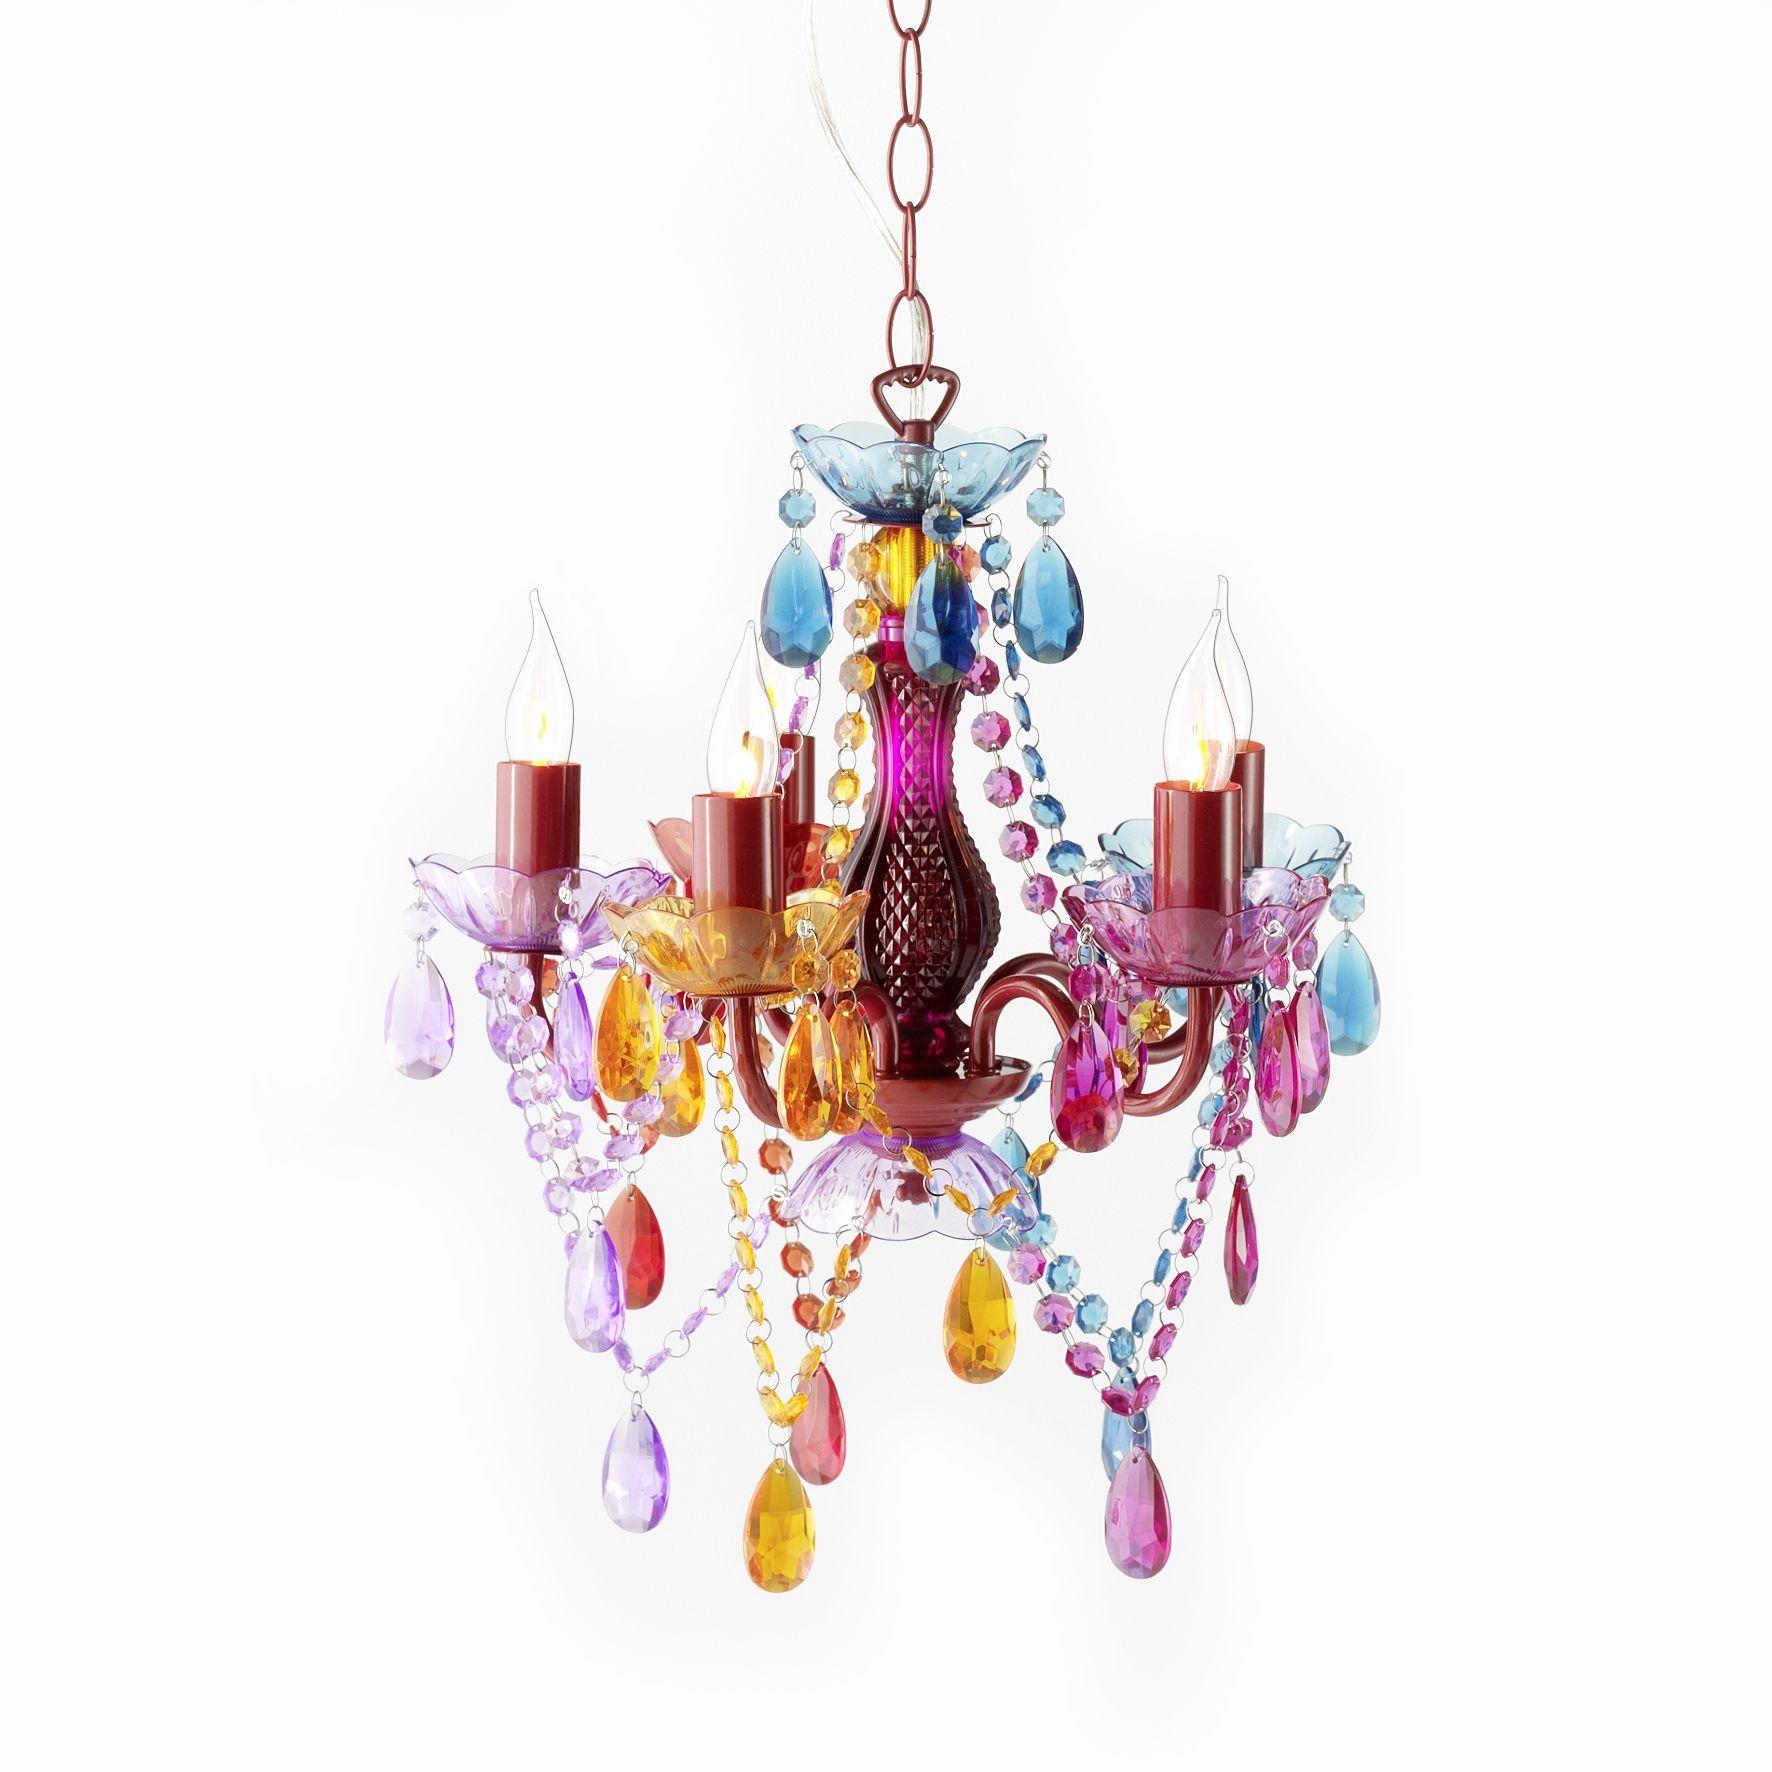 Pendant Starlight Chandelier Barock Rainbow 5 Lights From Avoca